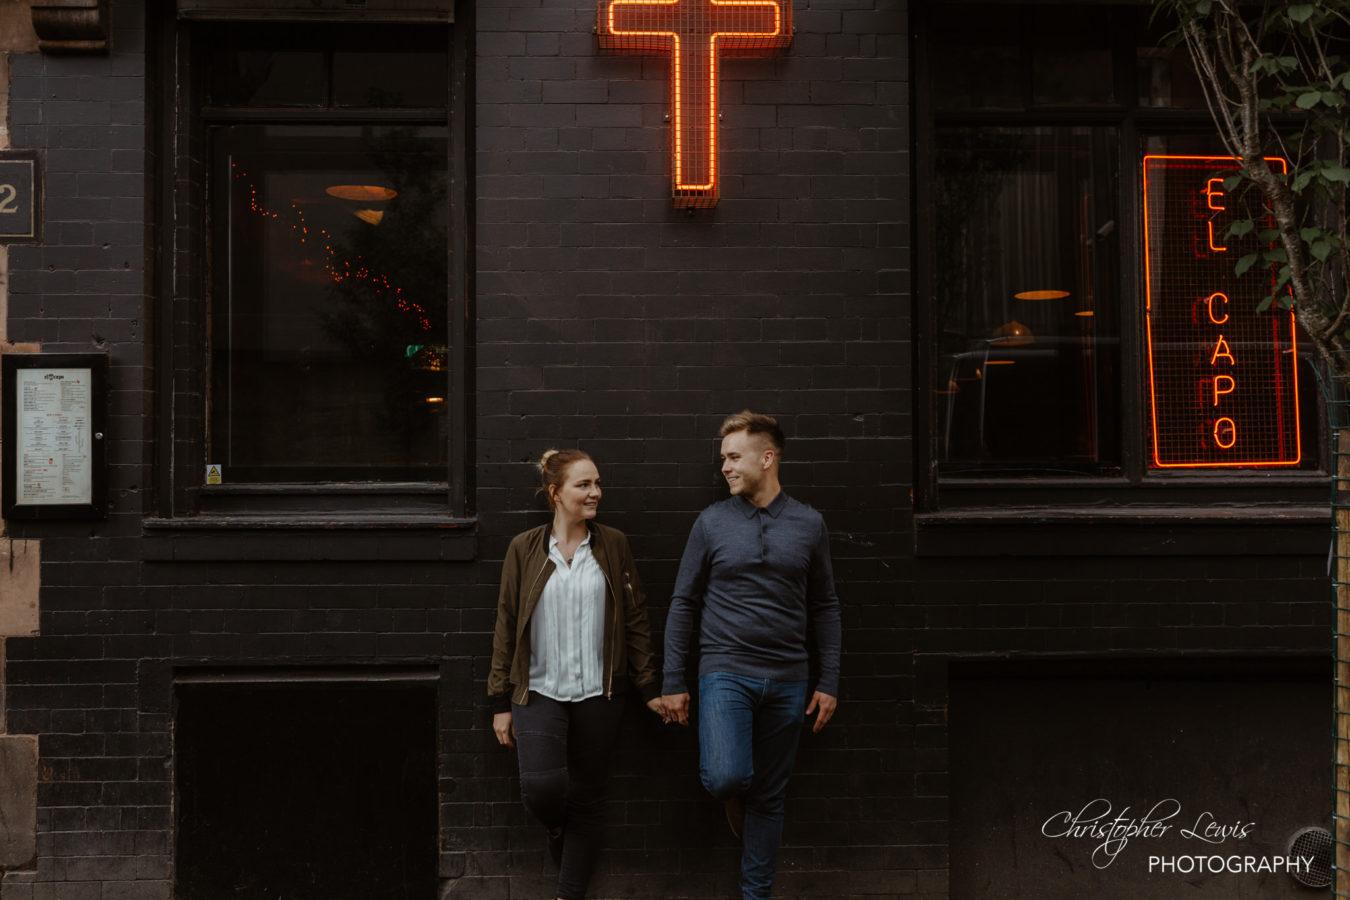 Northern-Quarter-Manchester-Pre-Wedding-Photoshoot-20